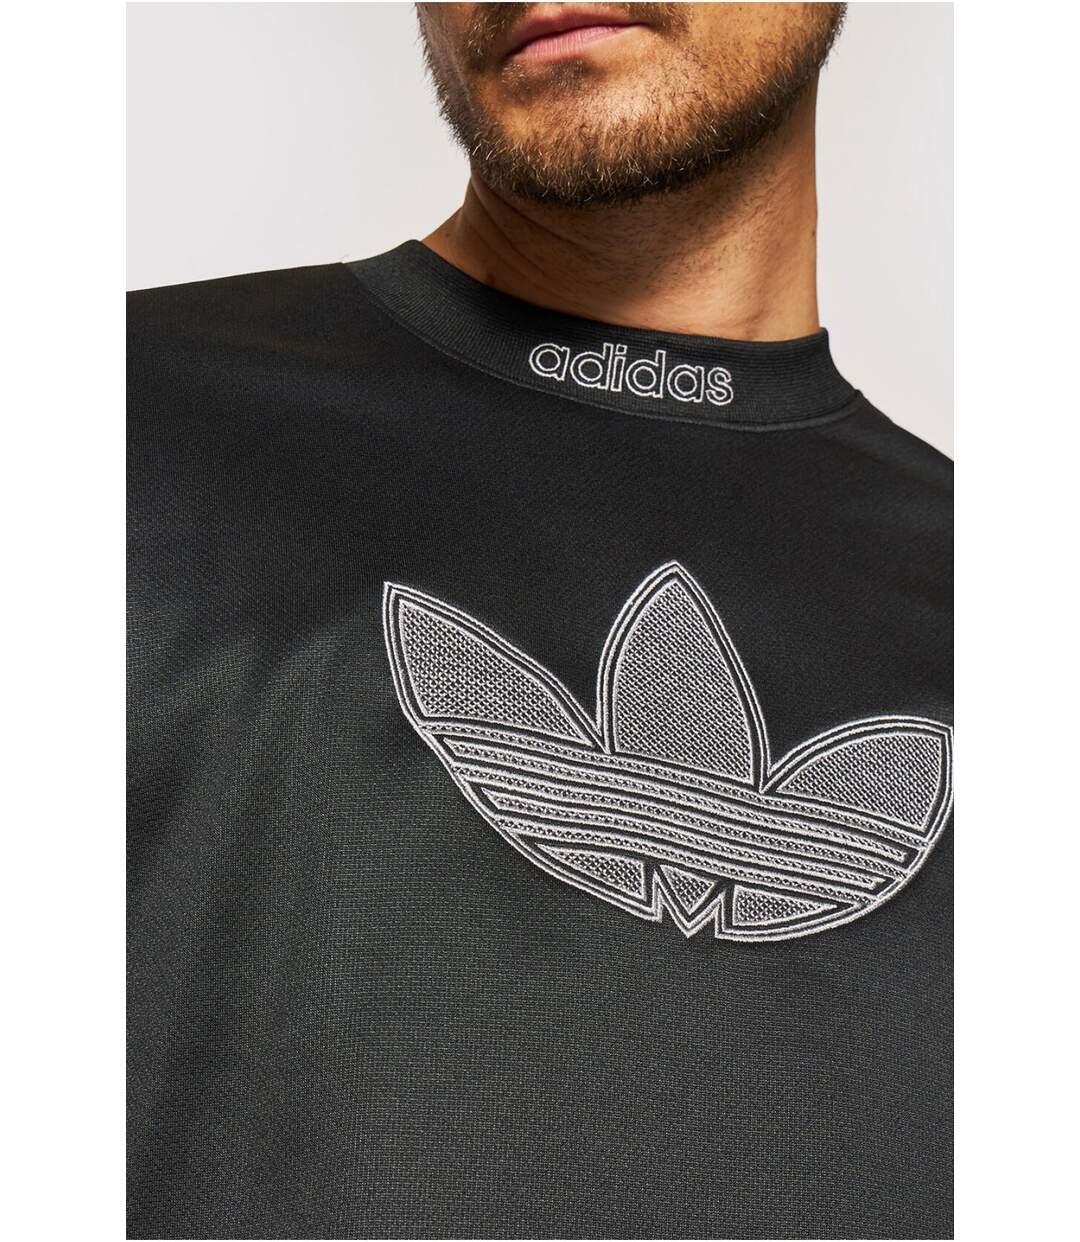 Sweat à gros logo brodé primegreen  -  Adidas - Homme